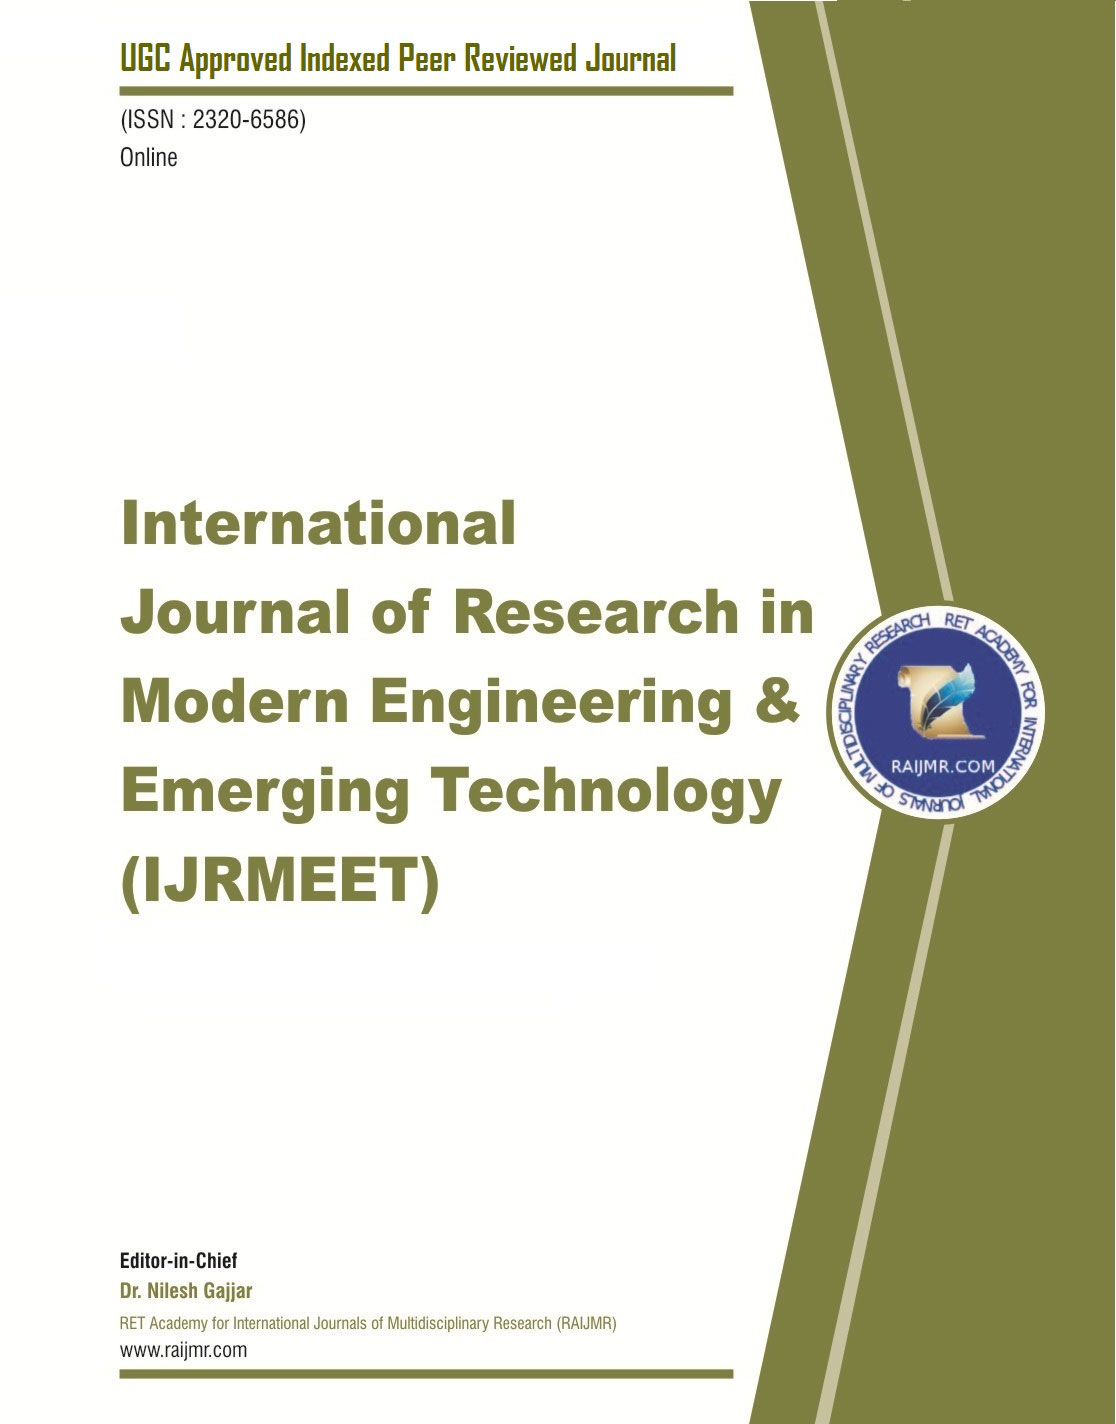 International Journal of Research in Modern Engineering